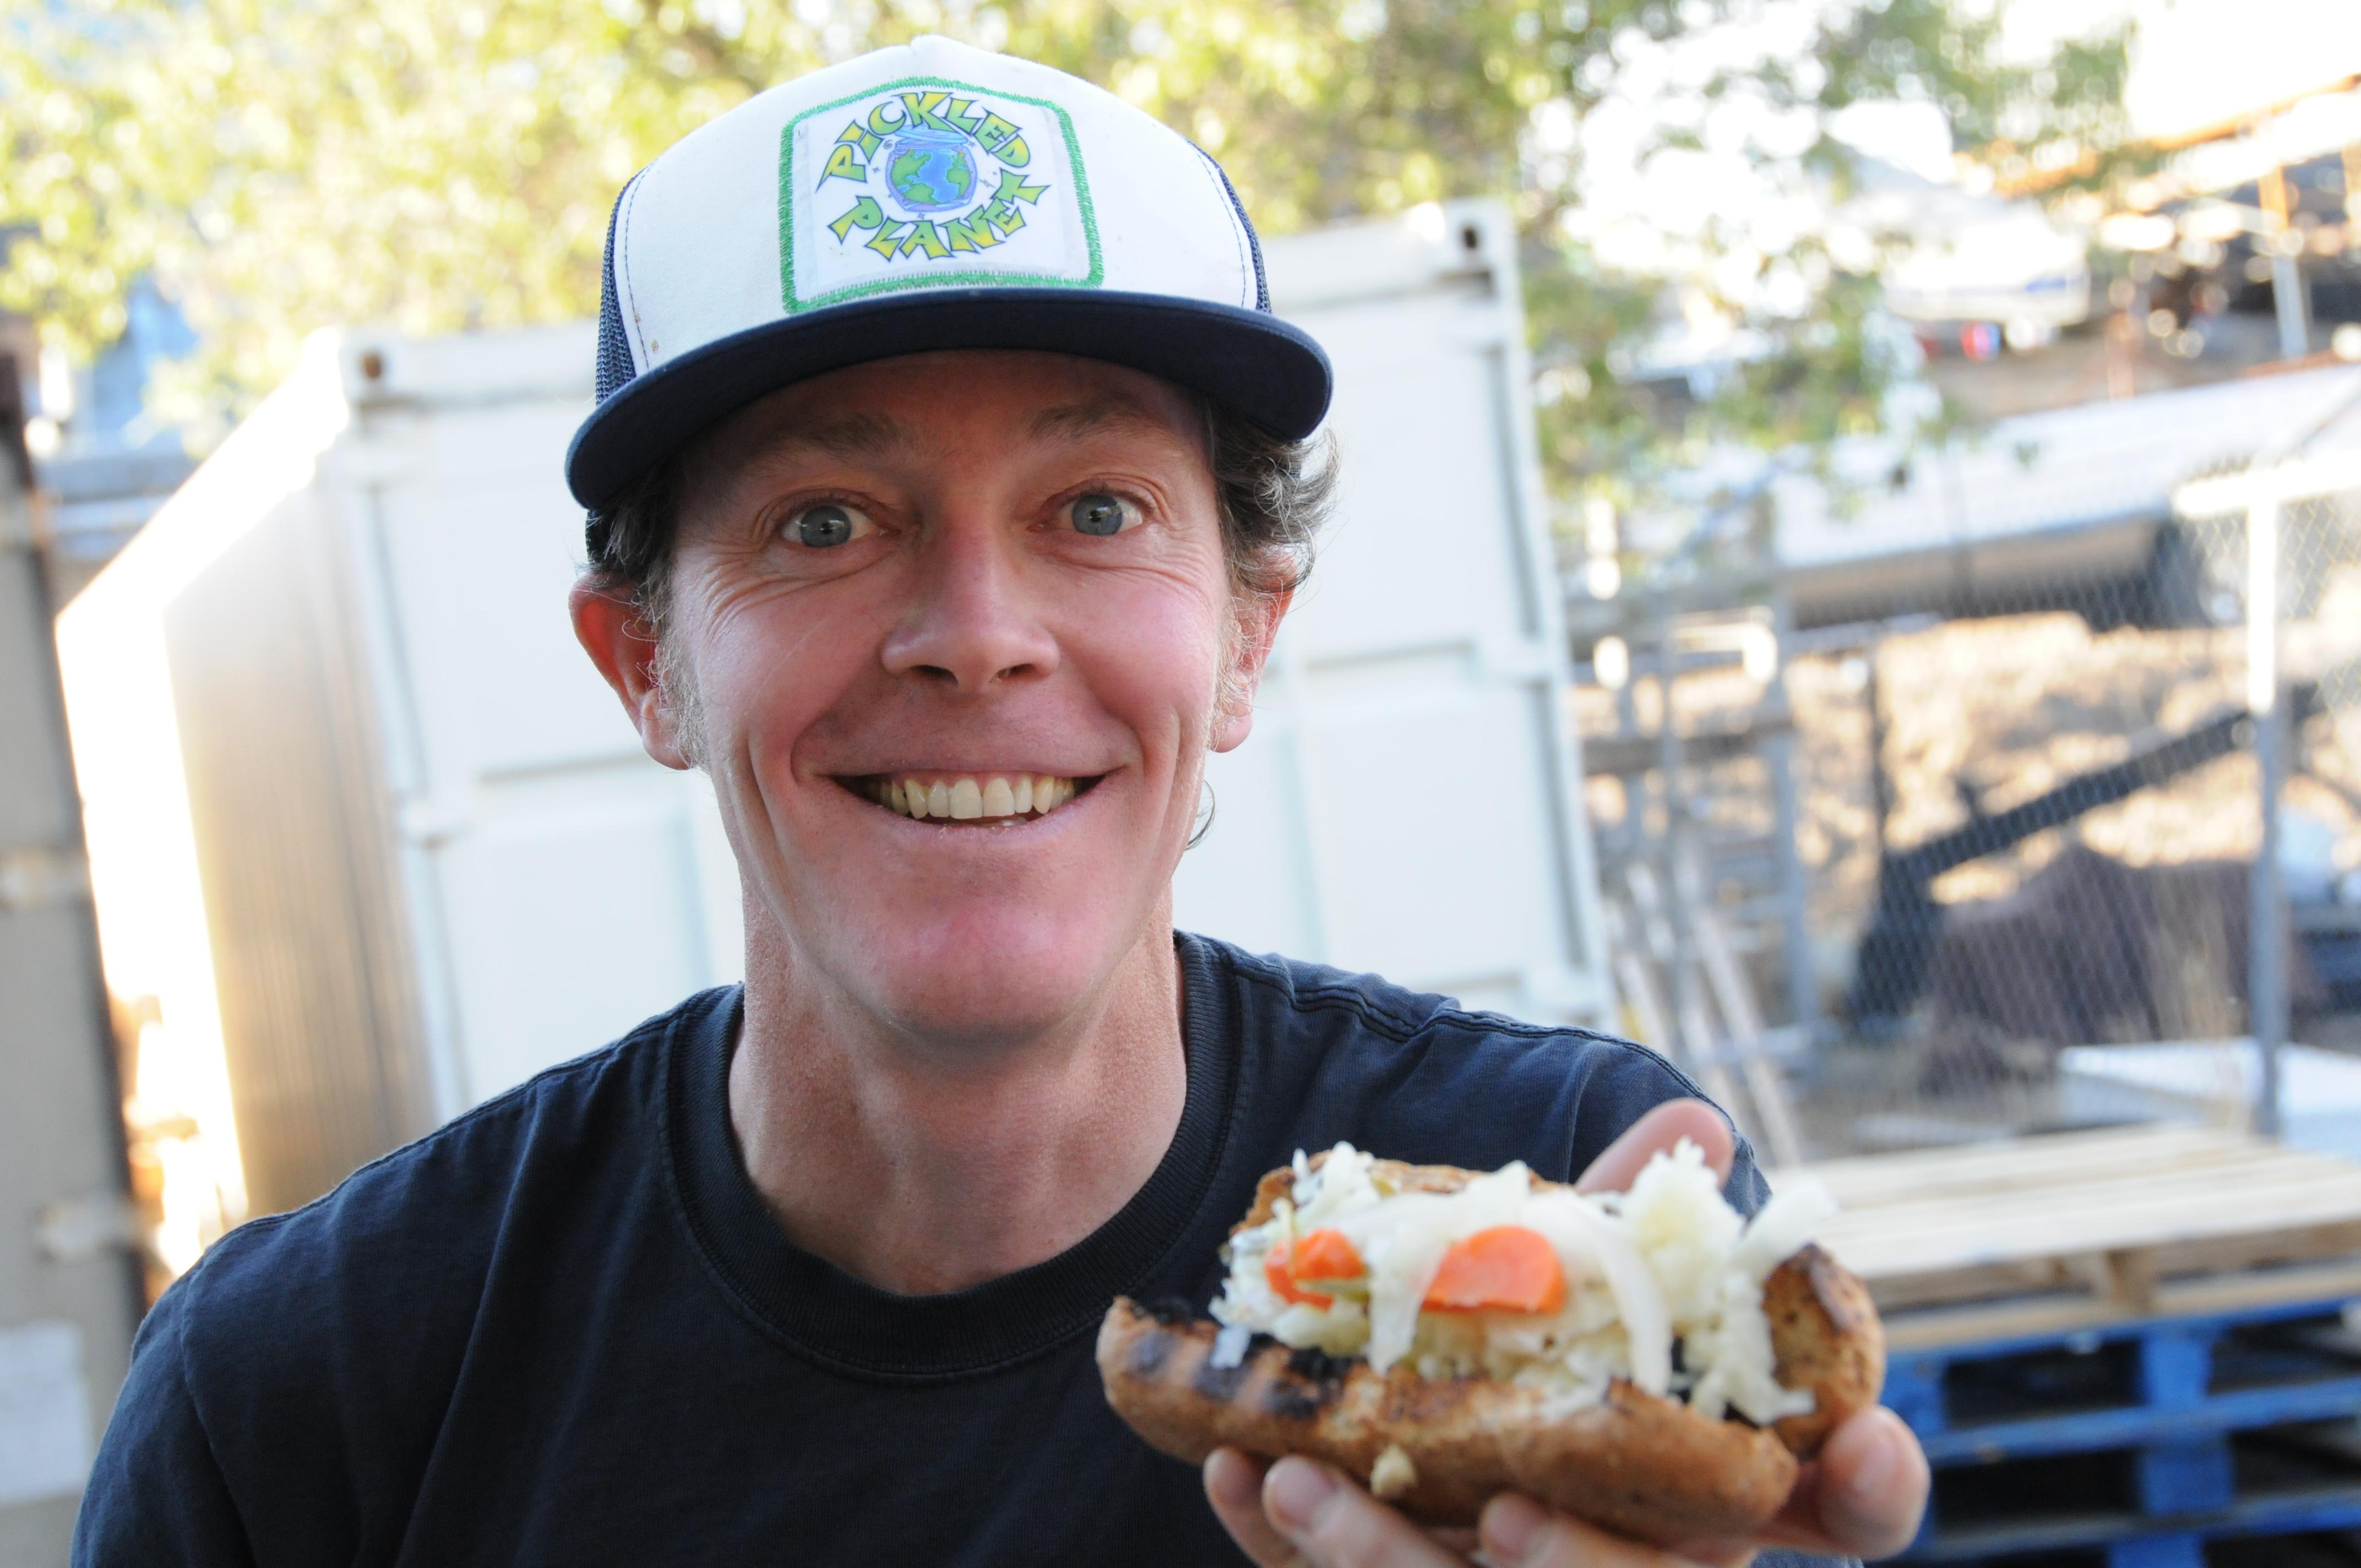 Owner of Pickled Planet Sauerkraut